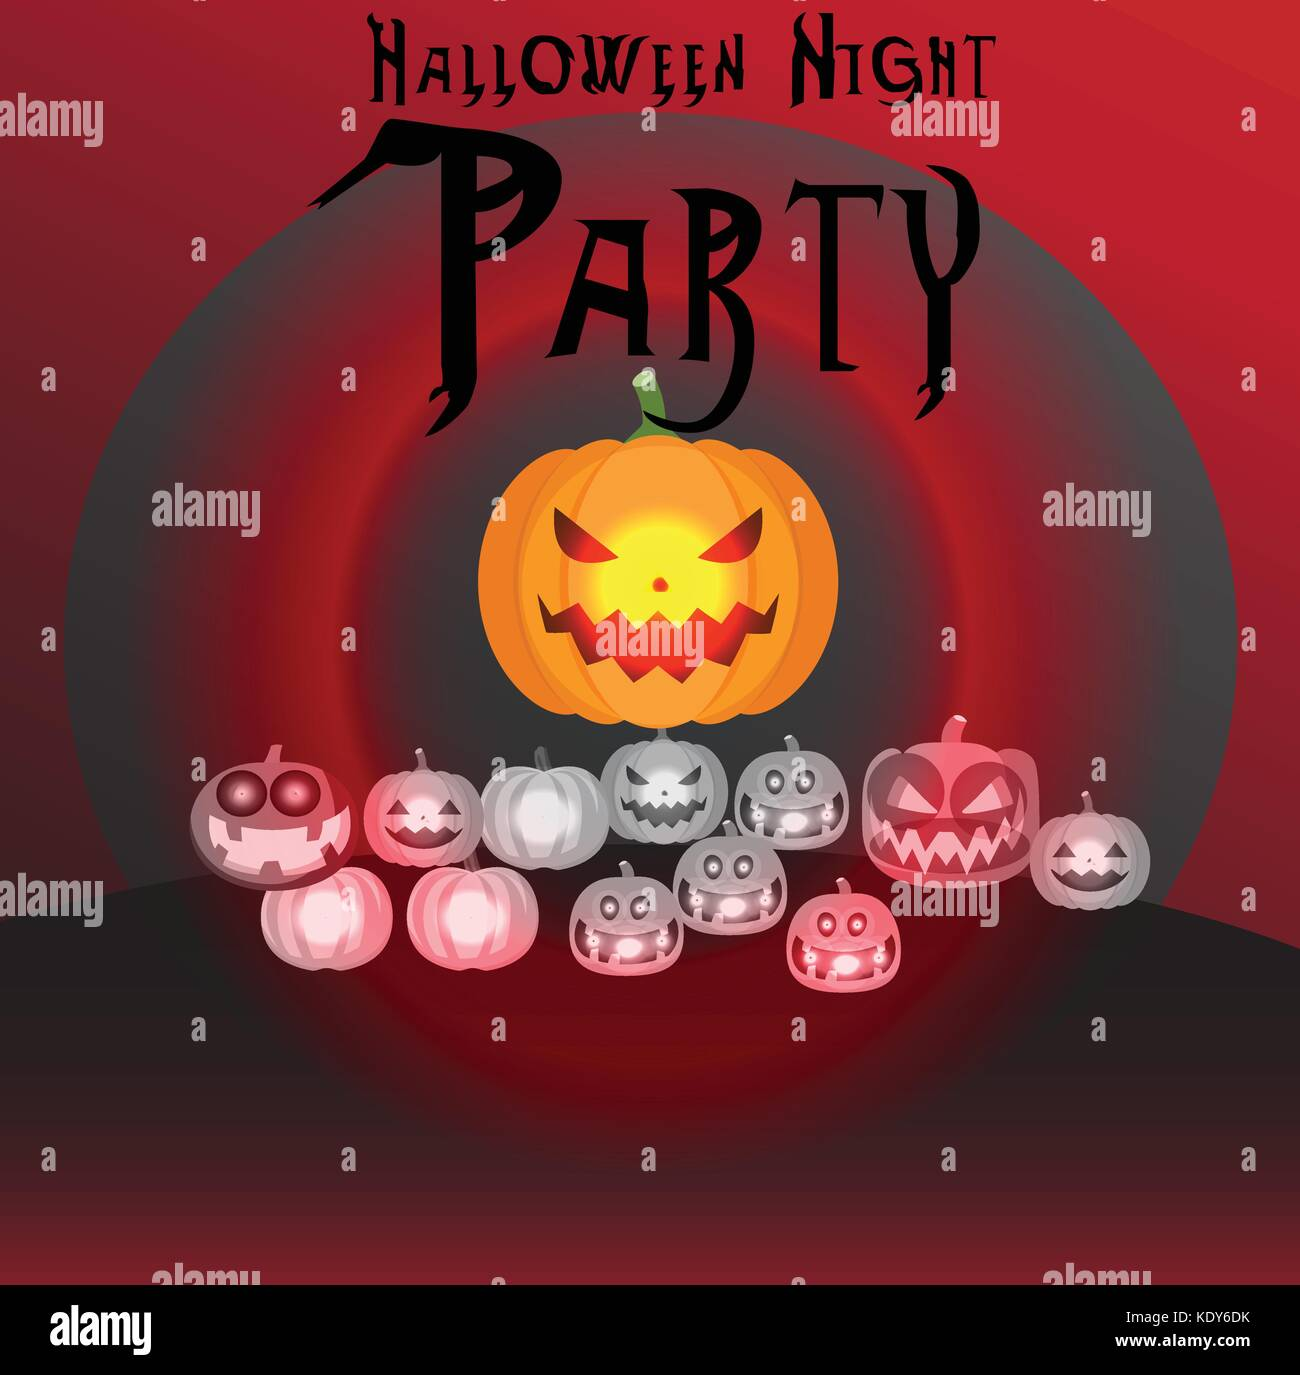 Artiste: dulyapon somsri; soir de l'halloween party poster, contexte, contexte, carte postale, invitation Photo Stock